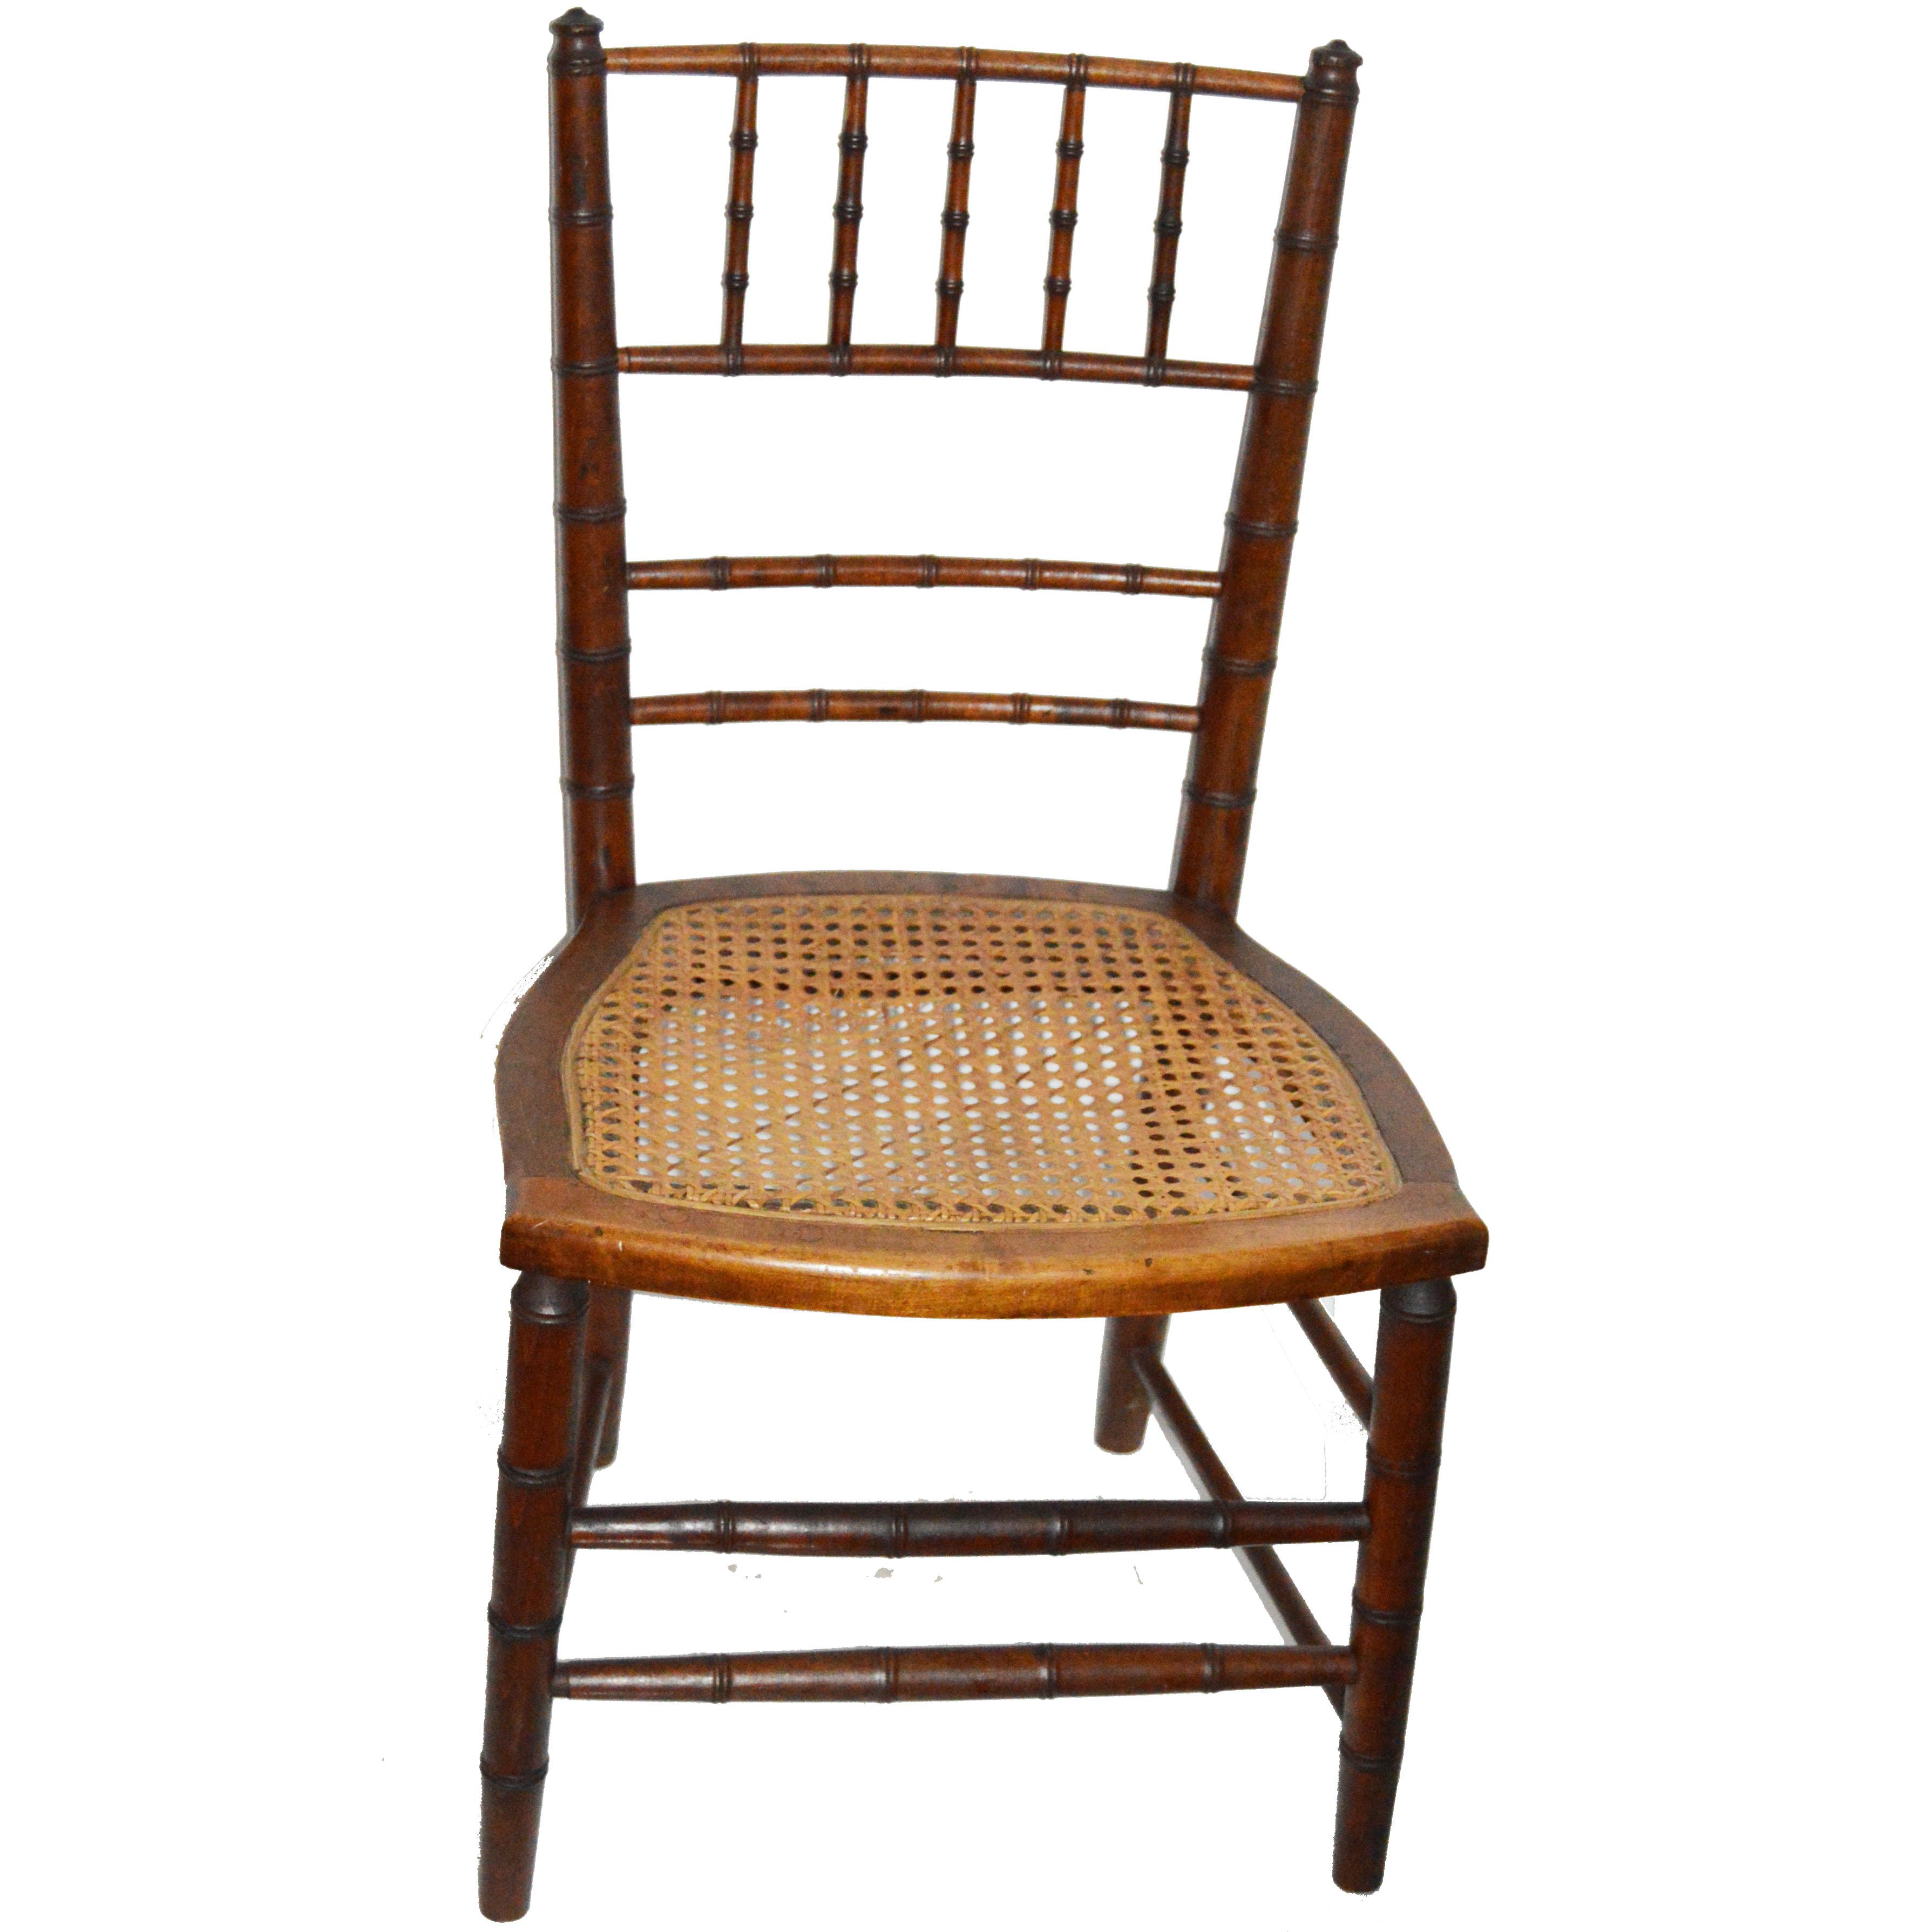 childs rattan chair desk jordans child s size ebth